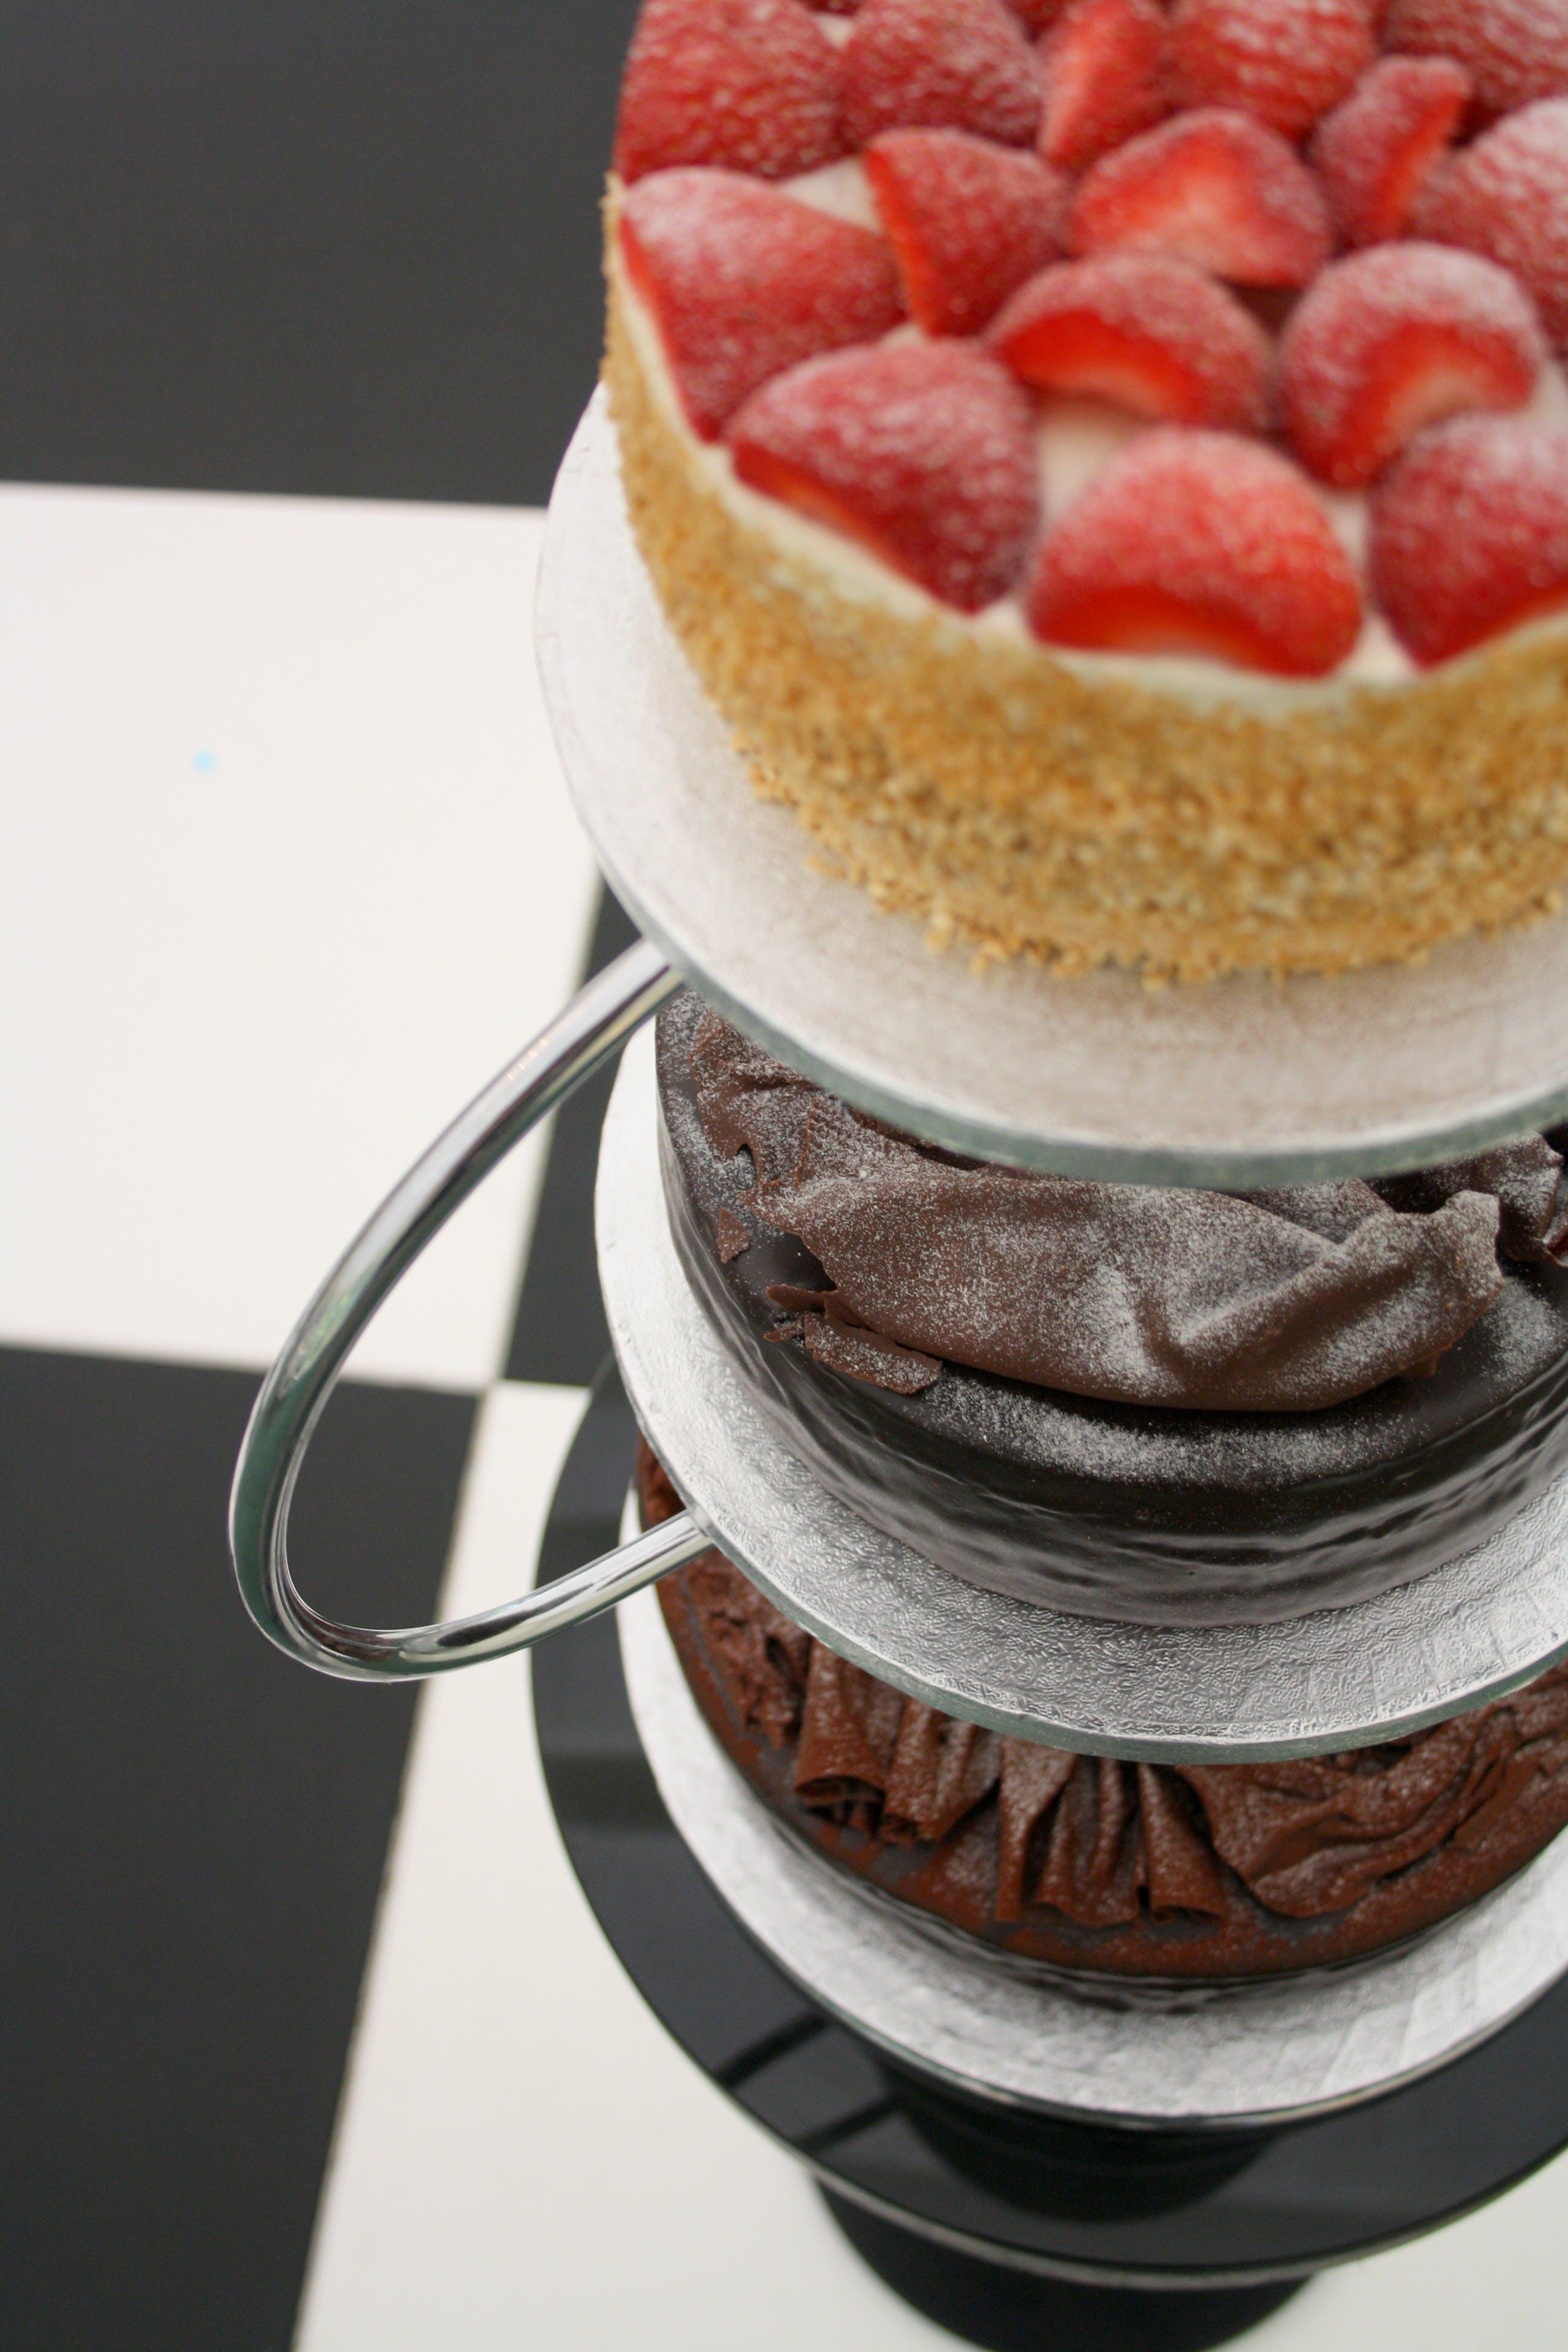 Gratis stockfoto met cake, chocolade, close-up, concentratie